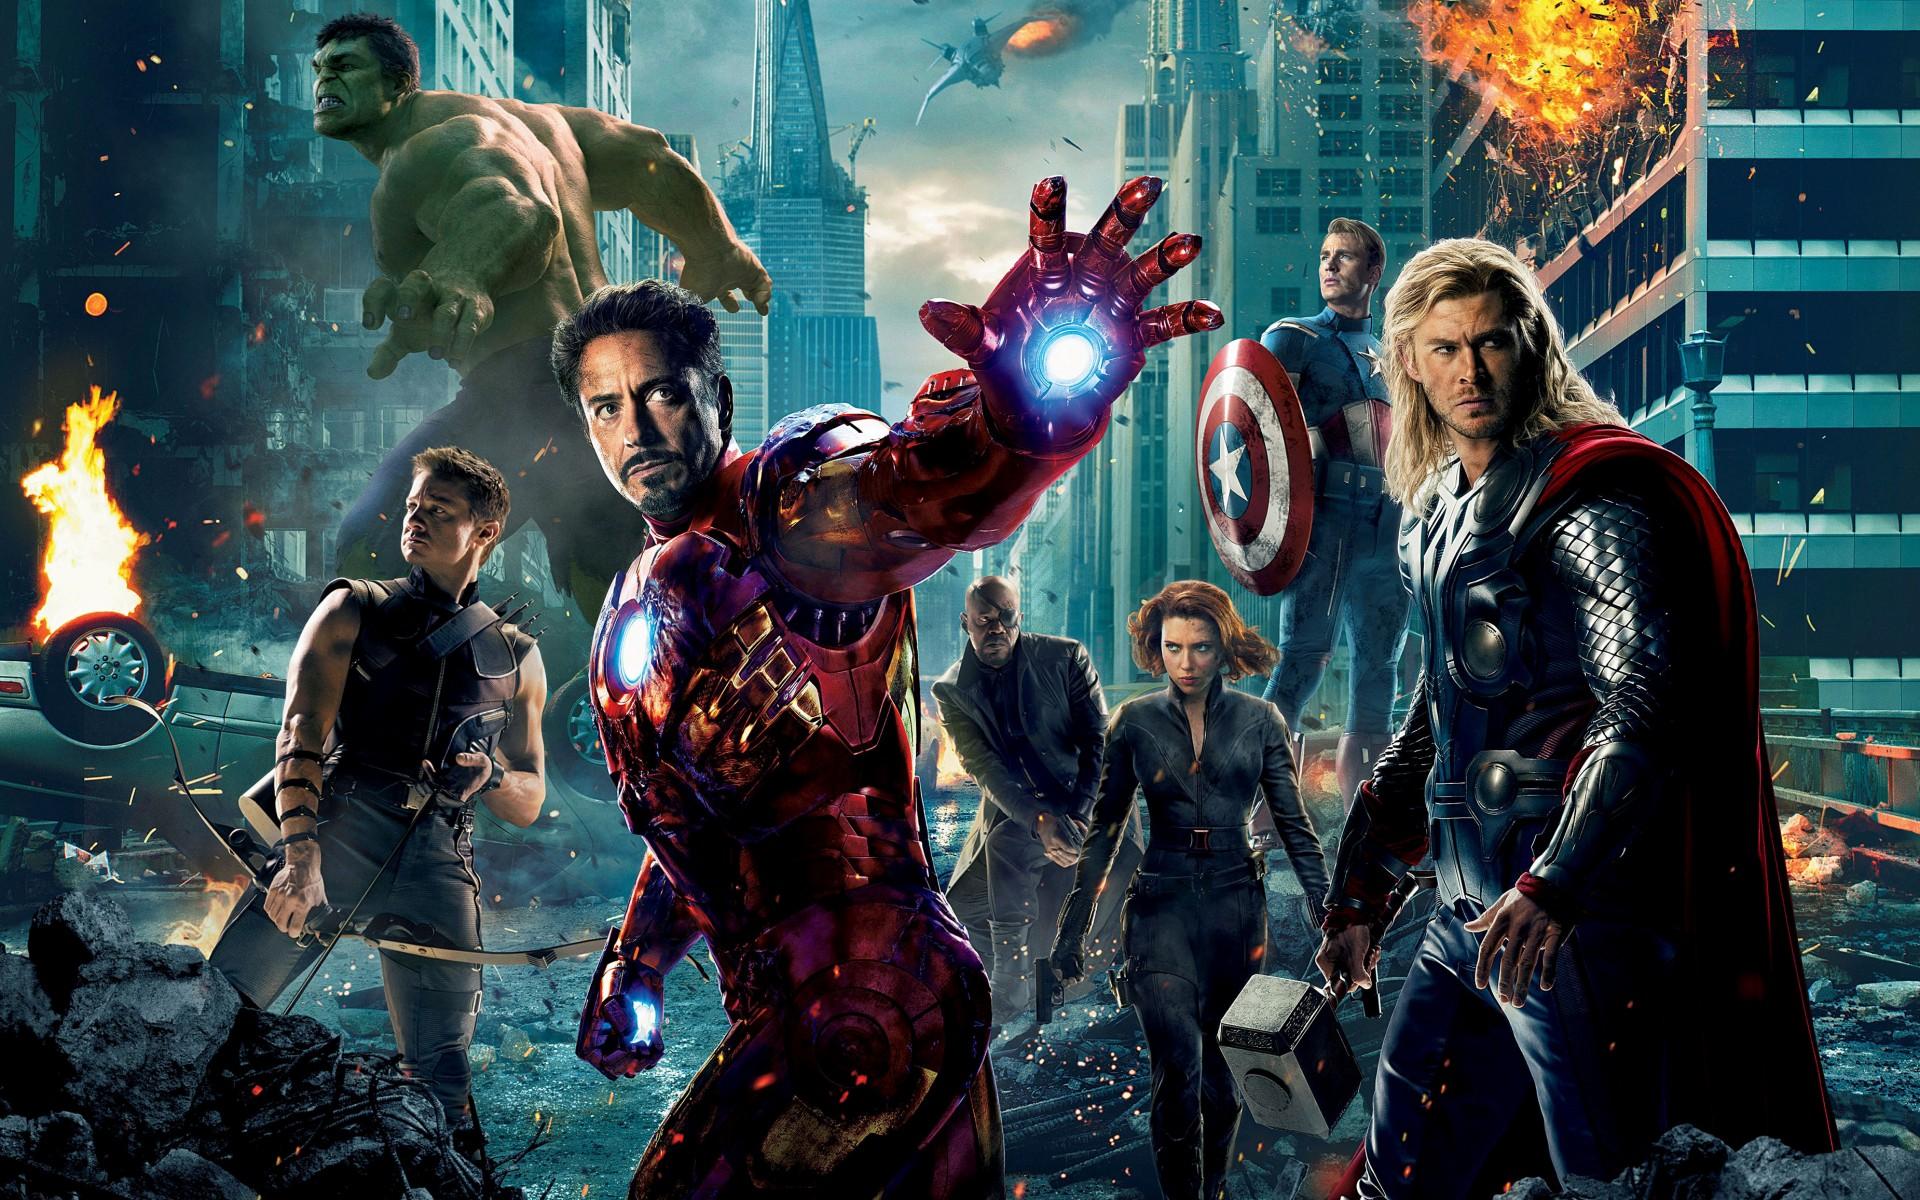 szmk_marvel_poster_avengers_bosszuallok_vasember_amerika_kapitany_thor_doctror_strange_iron_man_galaxis_orzoi_pokember_vegtelen_haboru_3_19.jpg